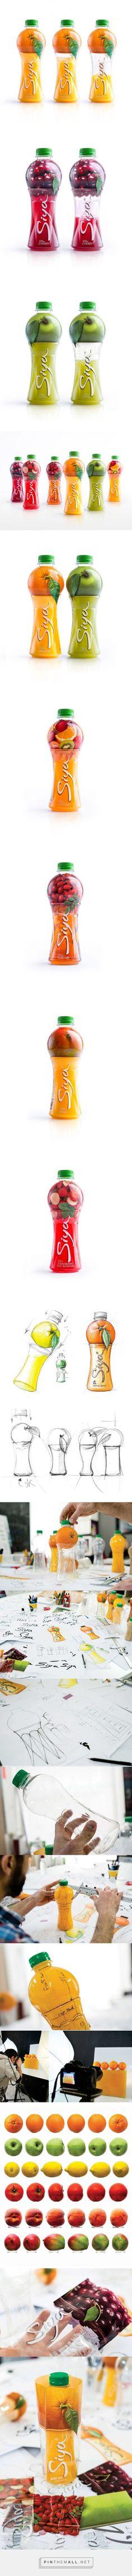 Fruit + juice glass = Fresh juice packaging - design by Backbone Branding (Armenia) - http://www.packagingoftheworld.com/2016/04/siya.html: